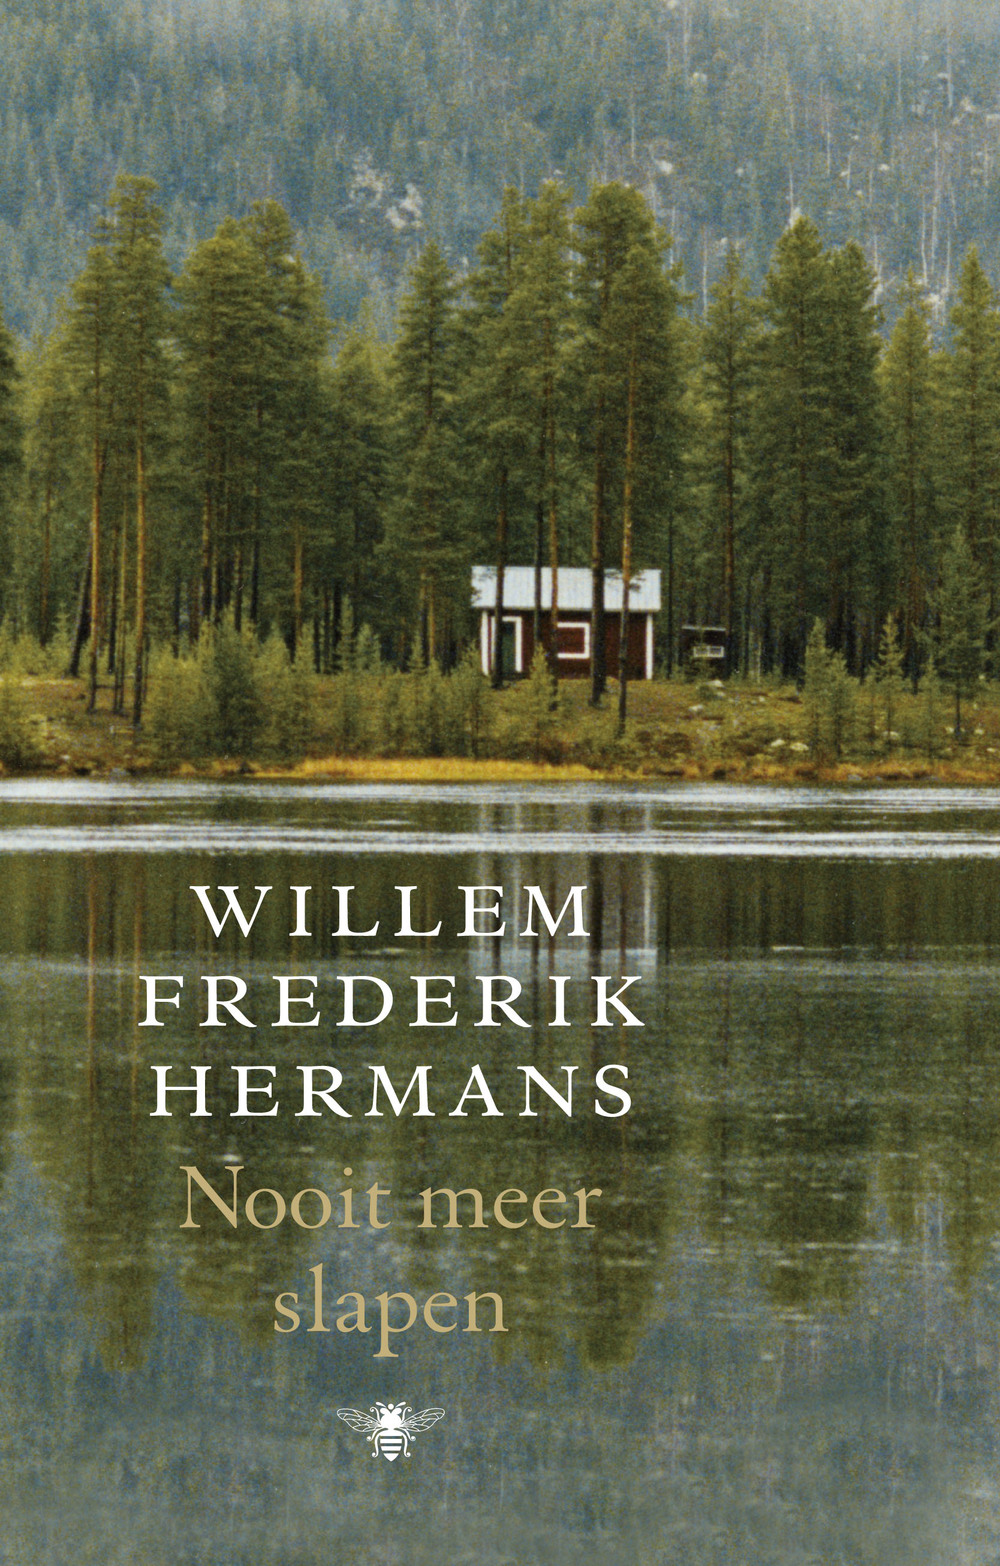 Hermans-Nooit-meer-slapen.jpg